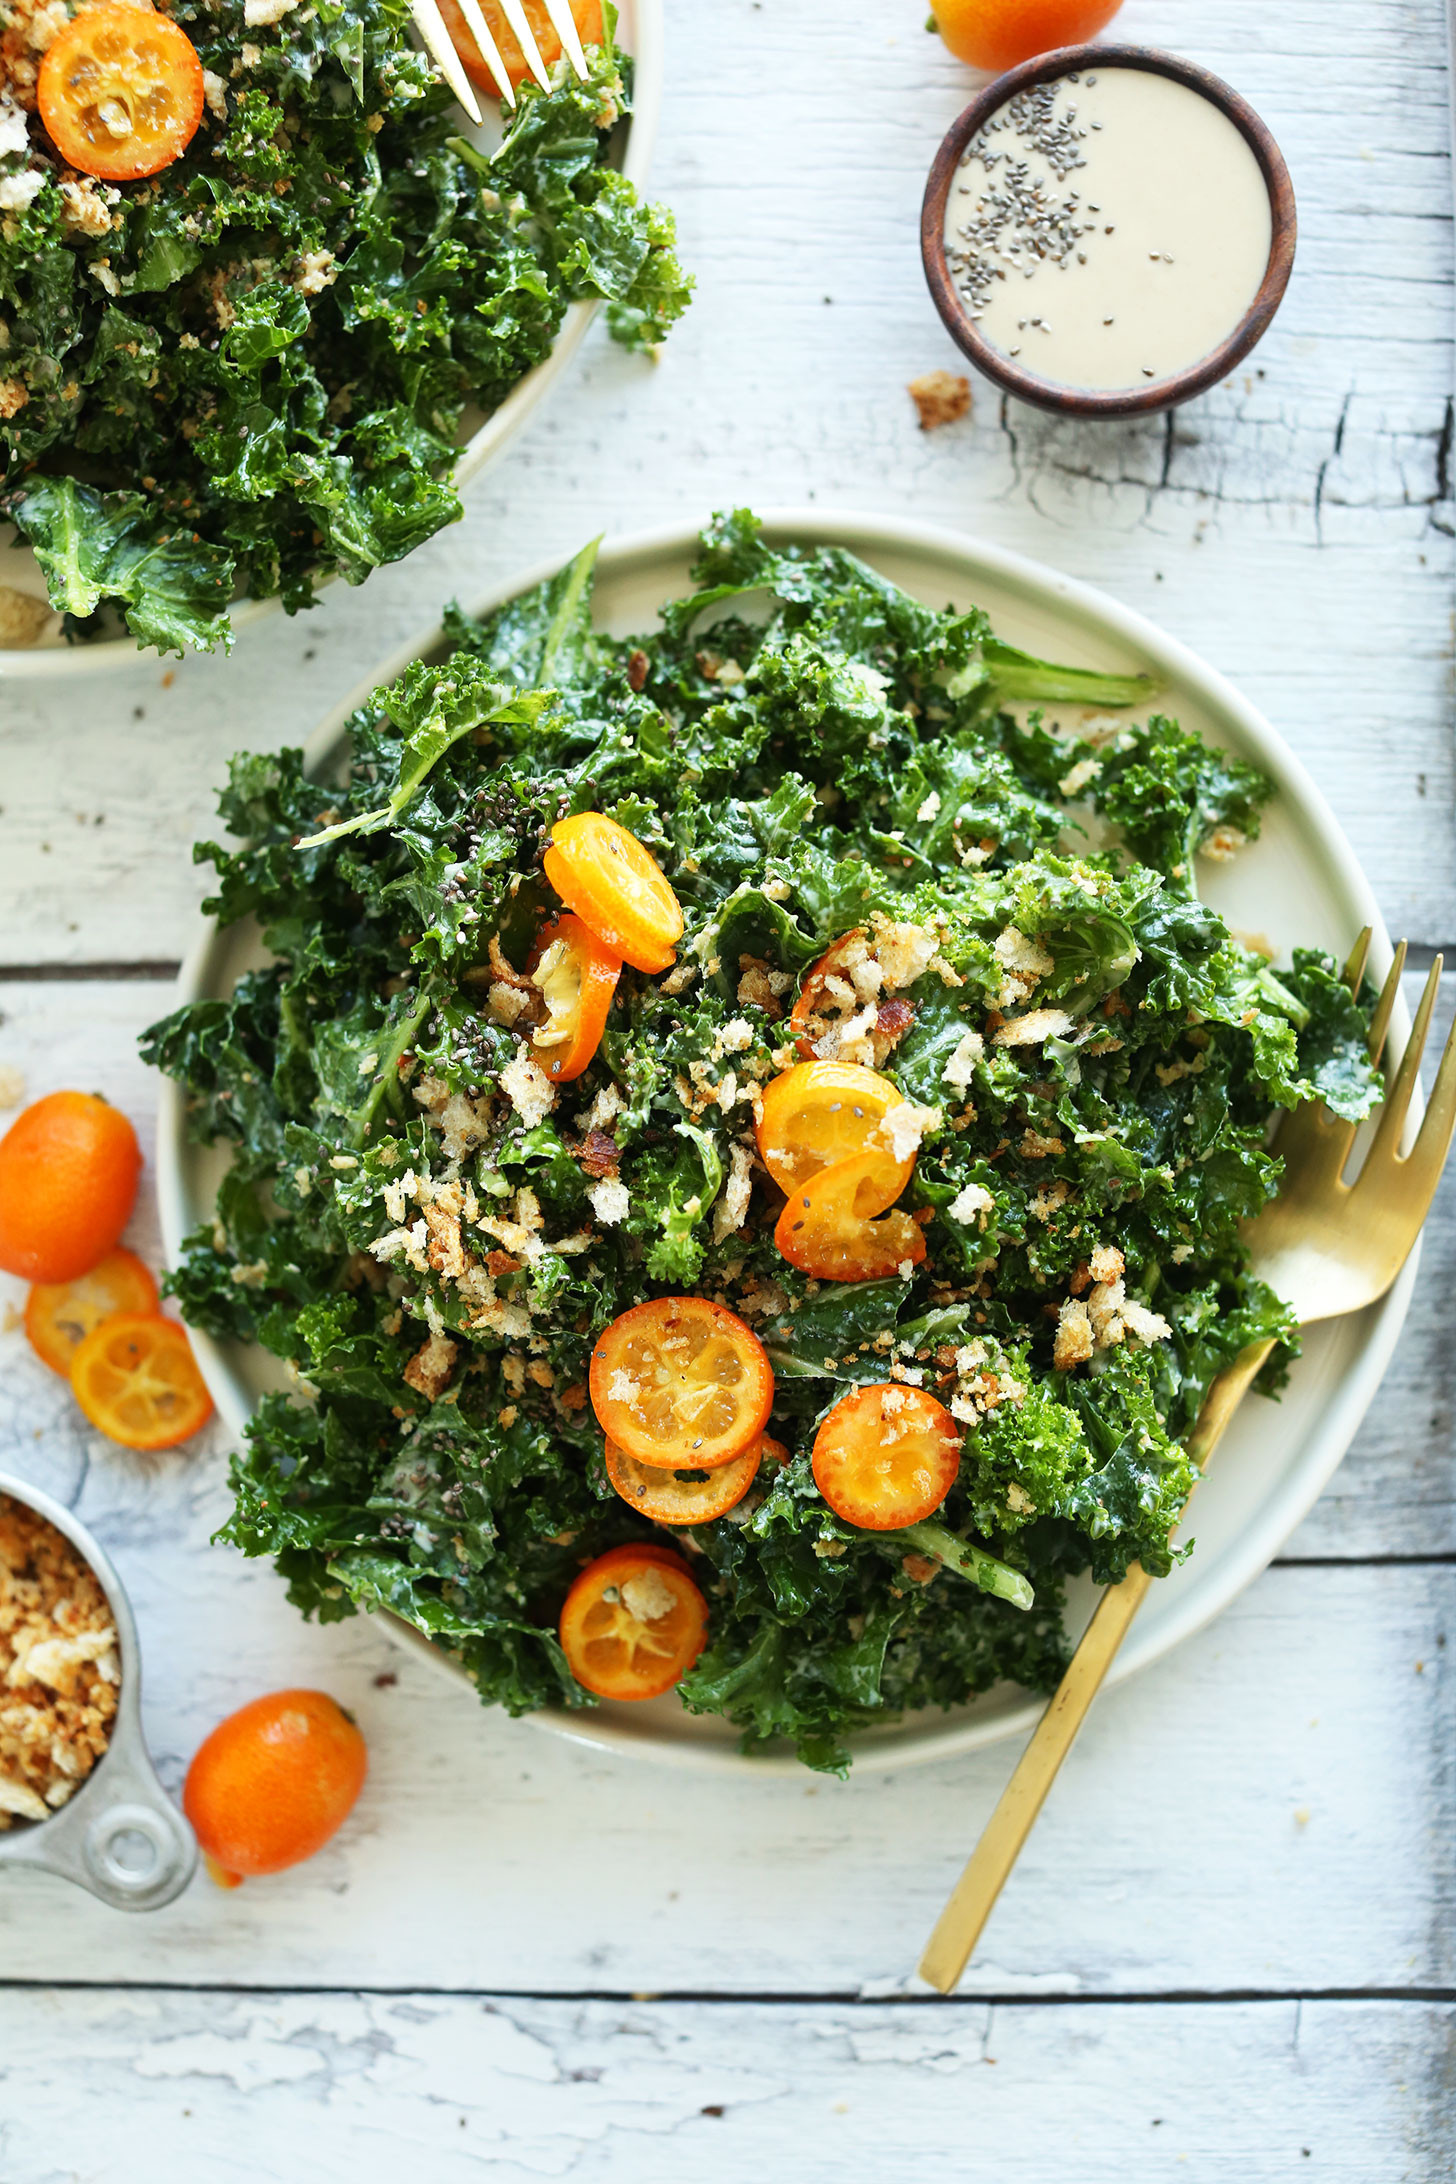 Kale Recipes Easy Healthy  Kumquat Kale Salad